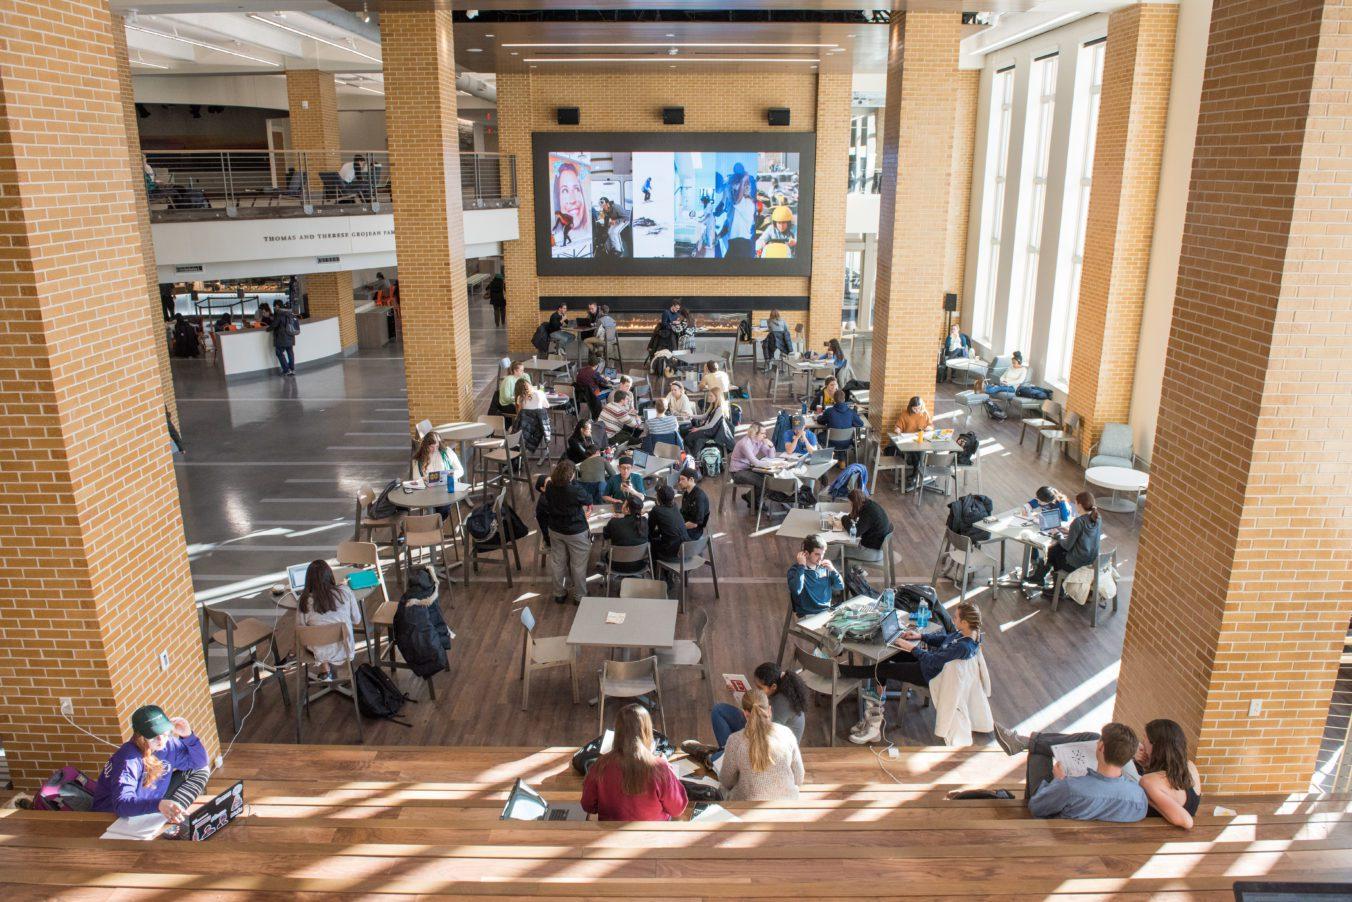 University of Notre Dame Duncan Student Center Interior